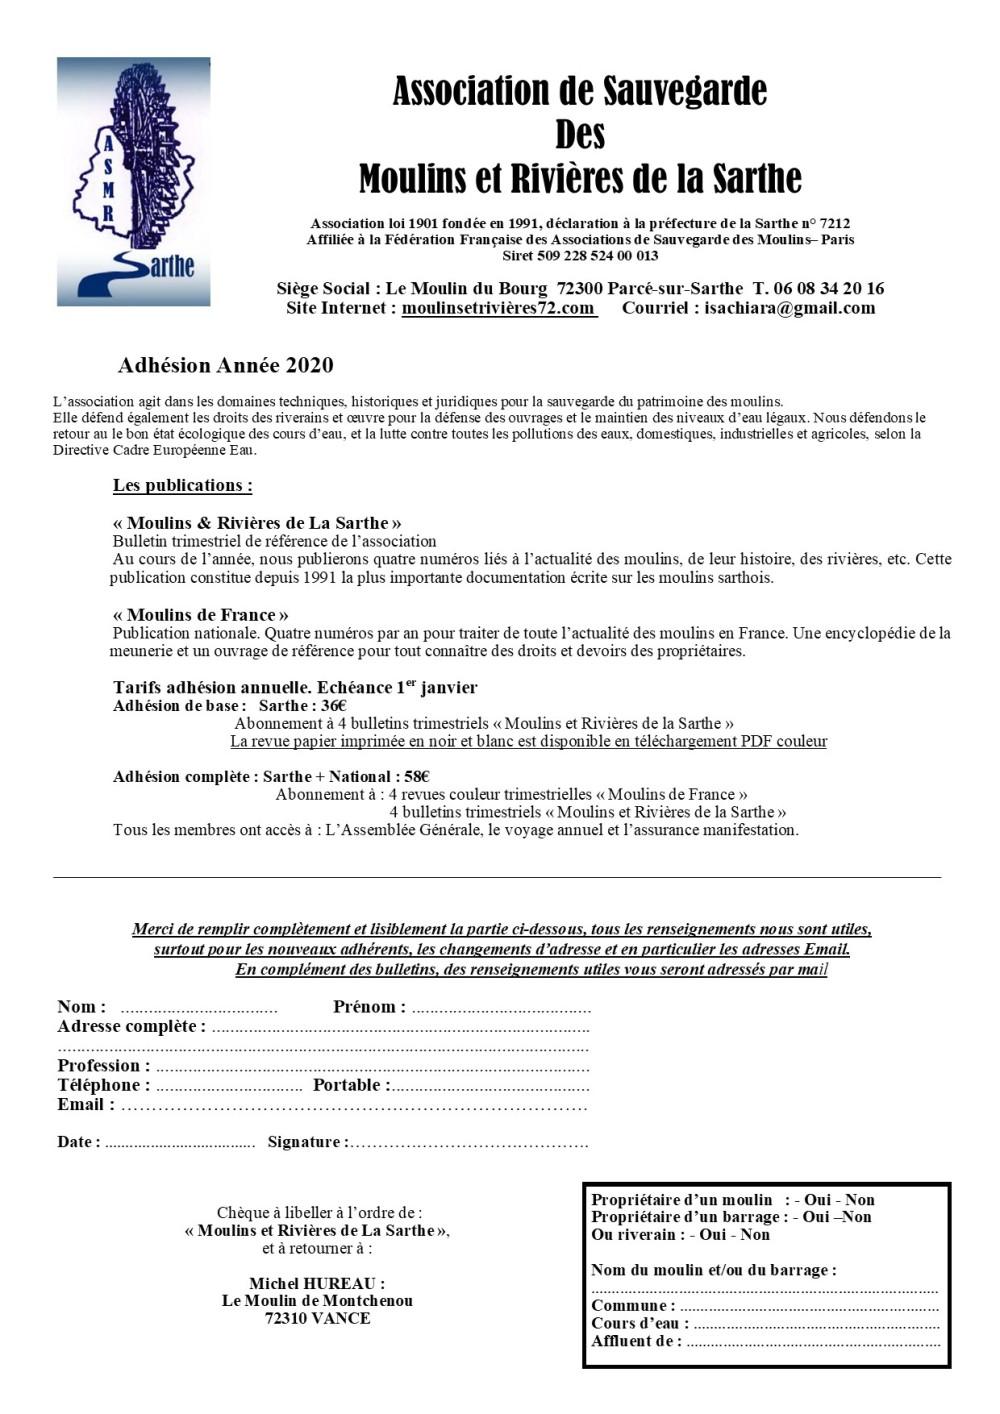 2020 Fiche Adhésion ASMR72 SANS RIB